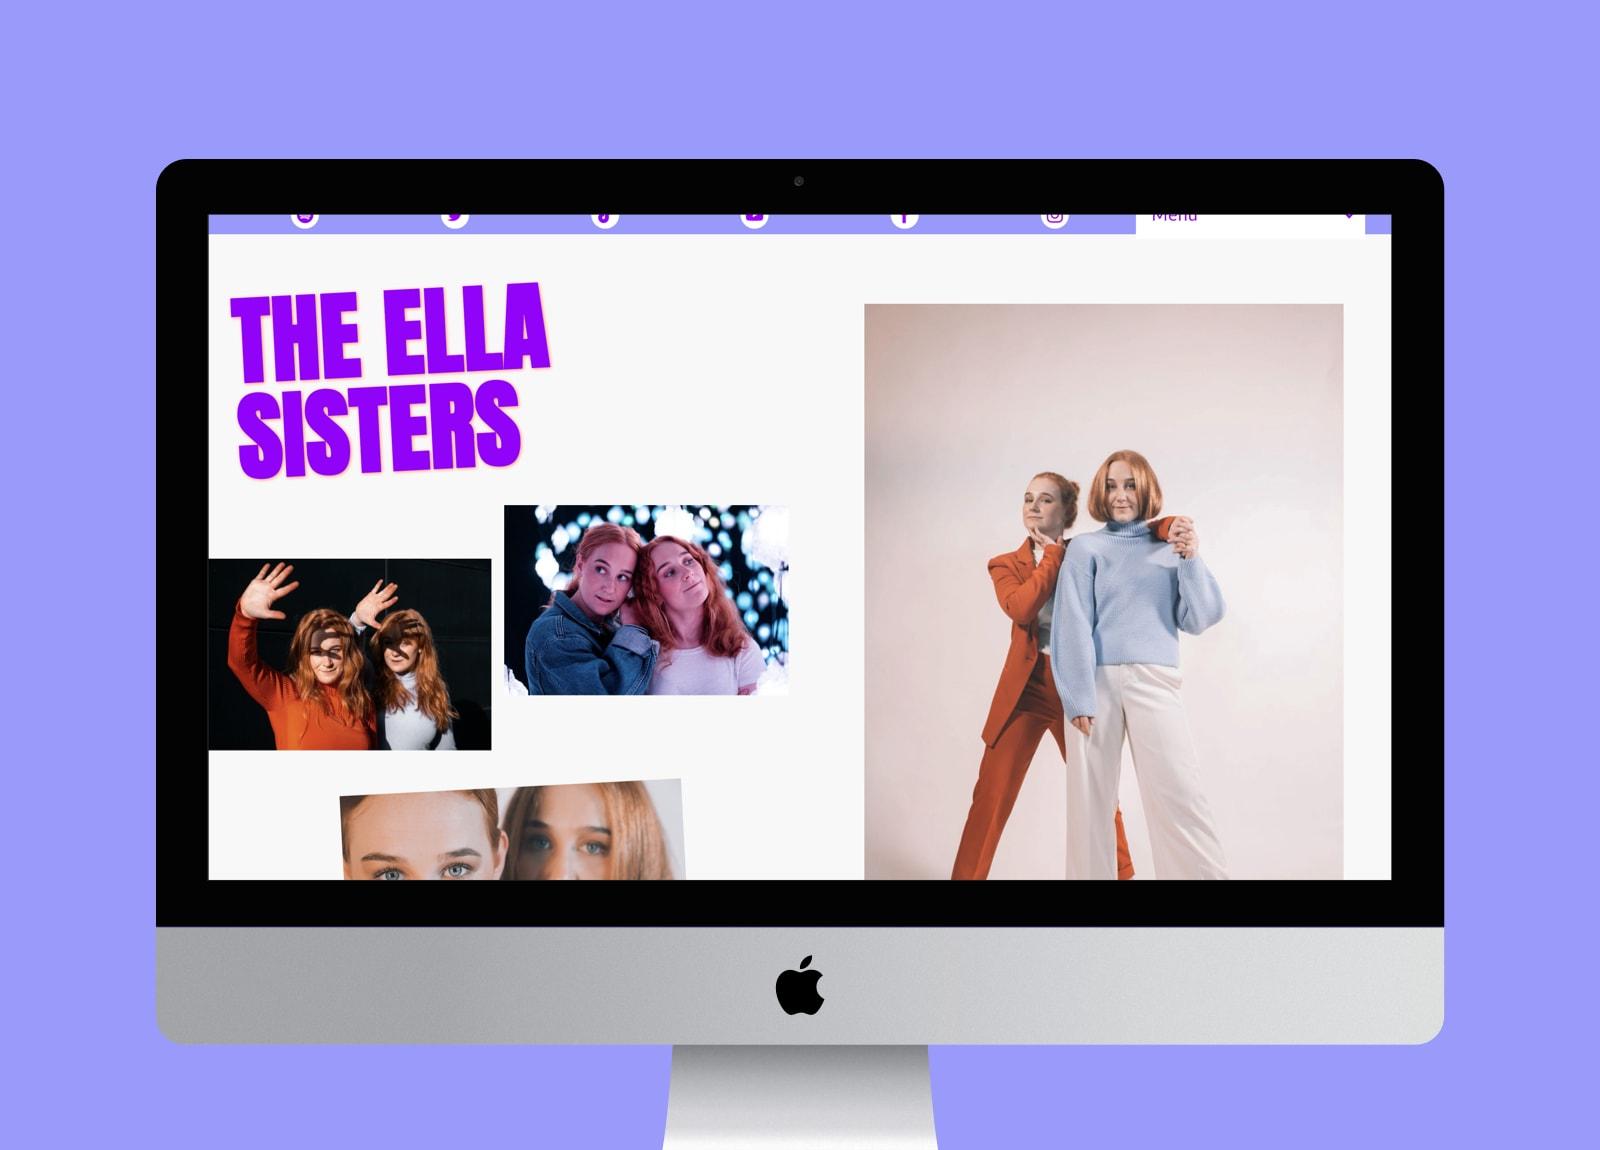 The Ella Siste